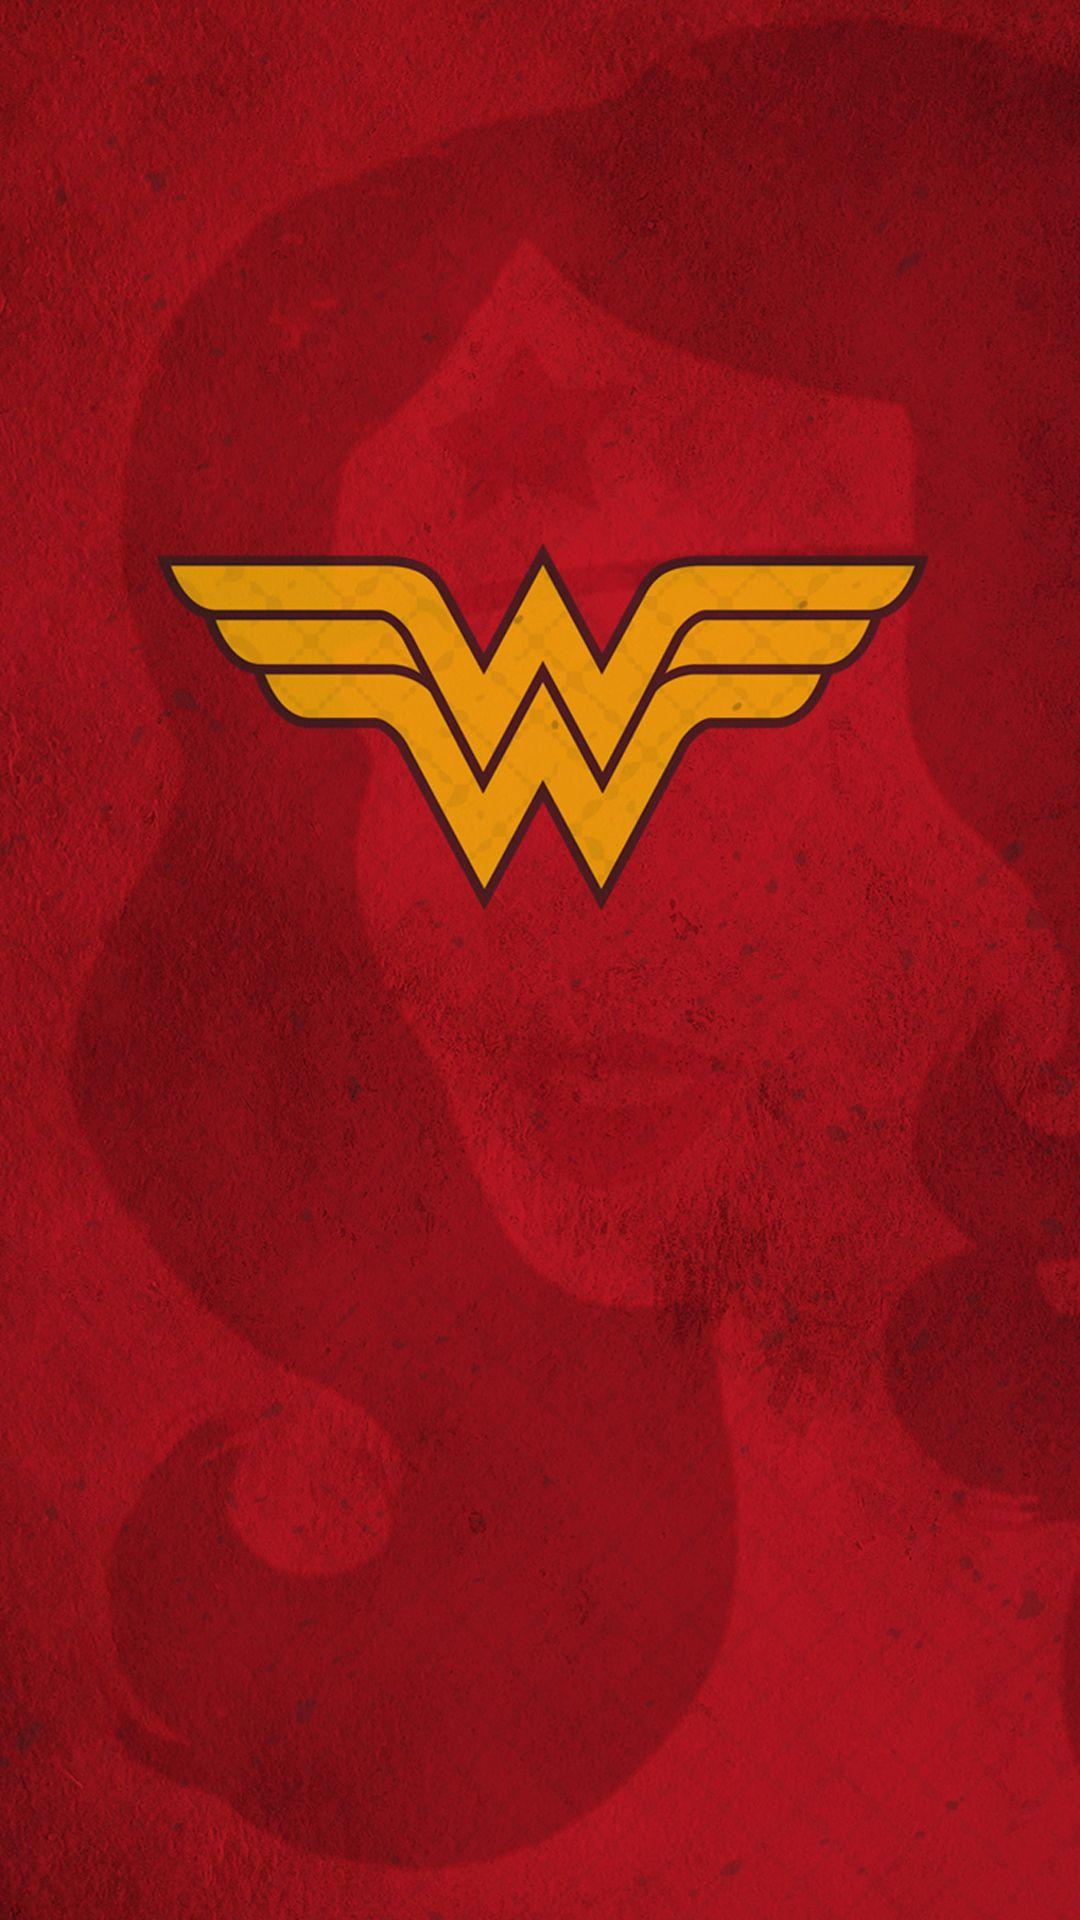 Wonder woman 01 iphone 6 plus dc comics iphone - Wonder woman wallpaper ...